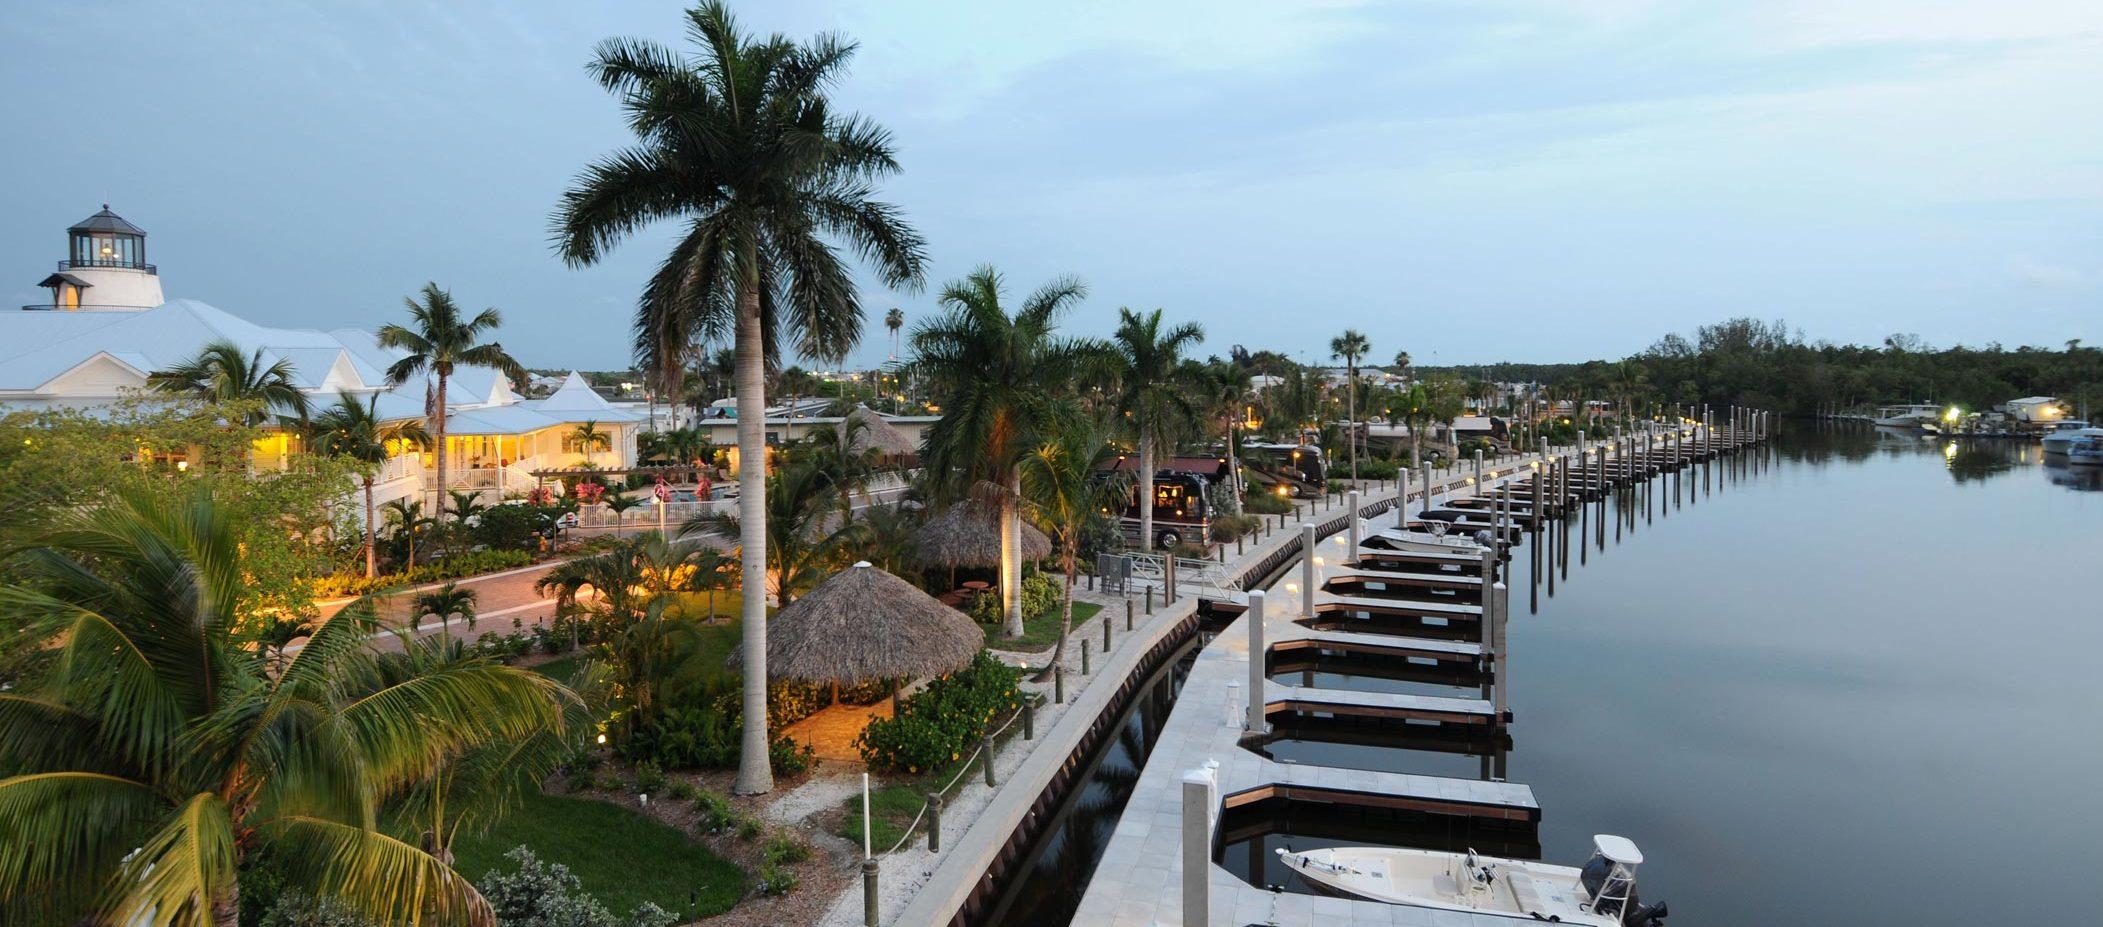 Everglades Isle Marina in Florida -Snag-A-Slip